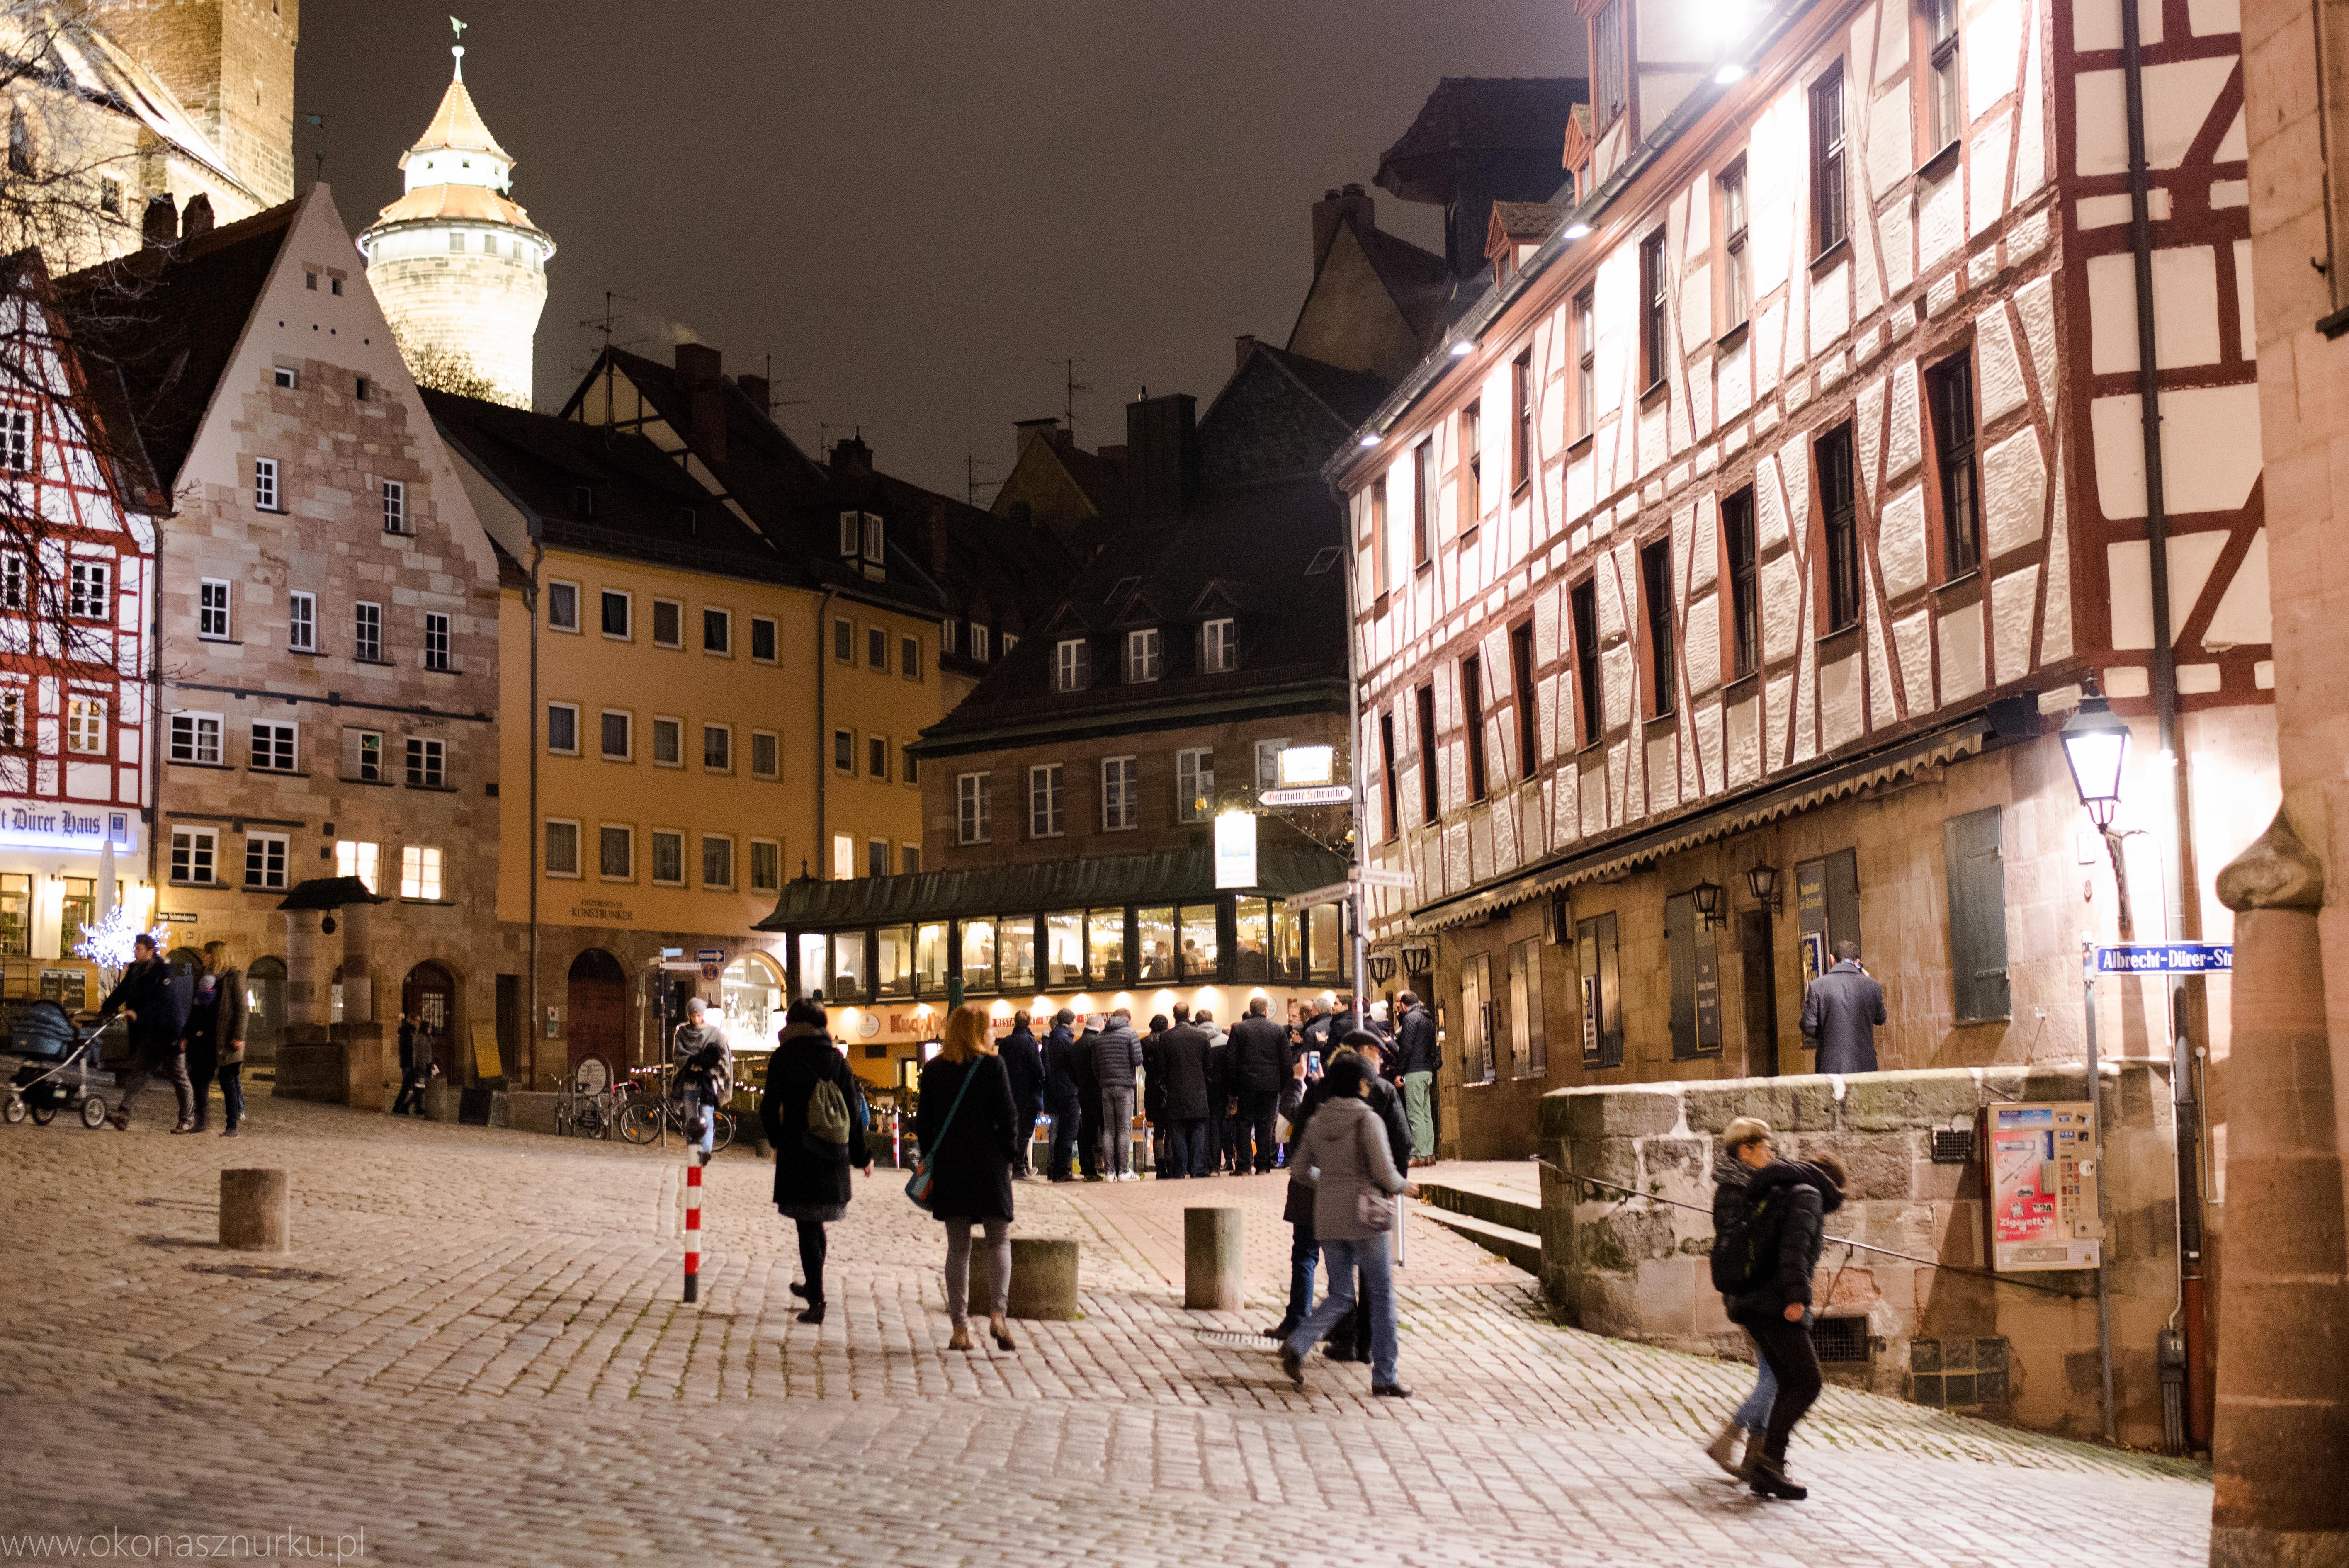 Nürnberg-stadt-norymberga-bayern-city-frankonia (17)